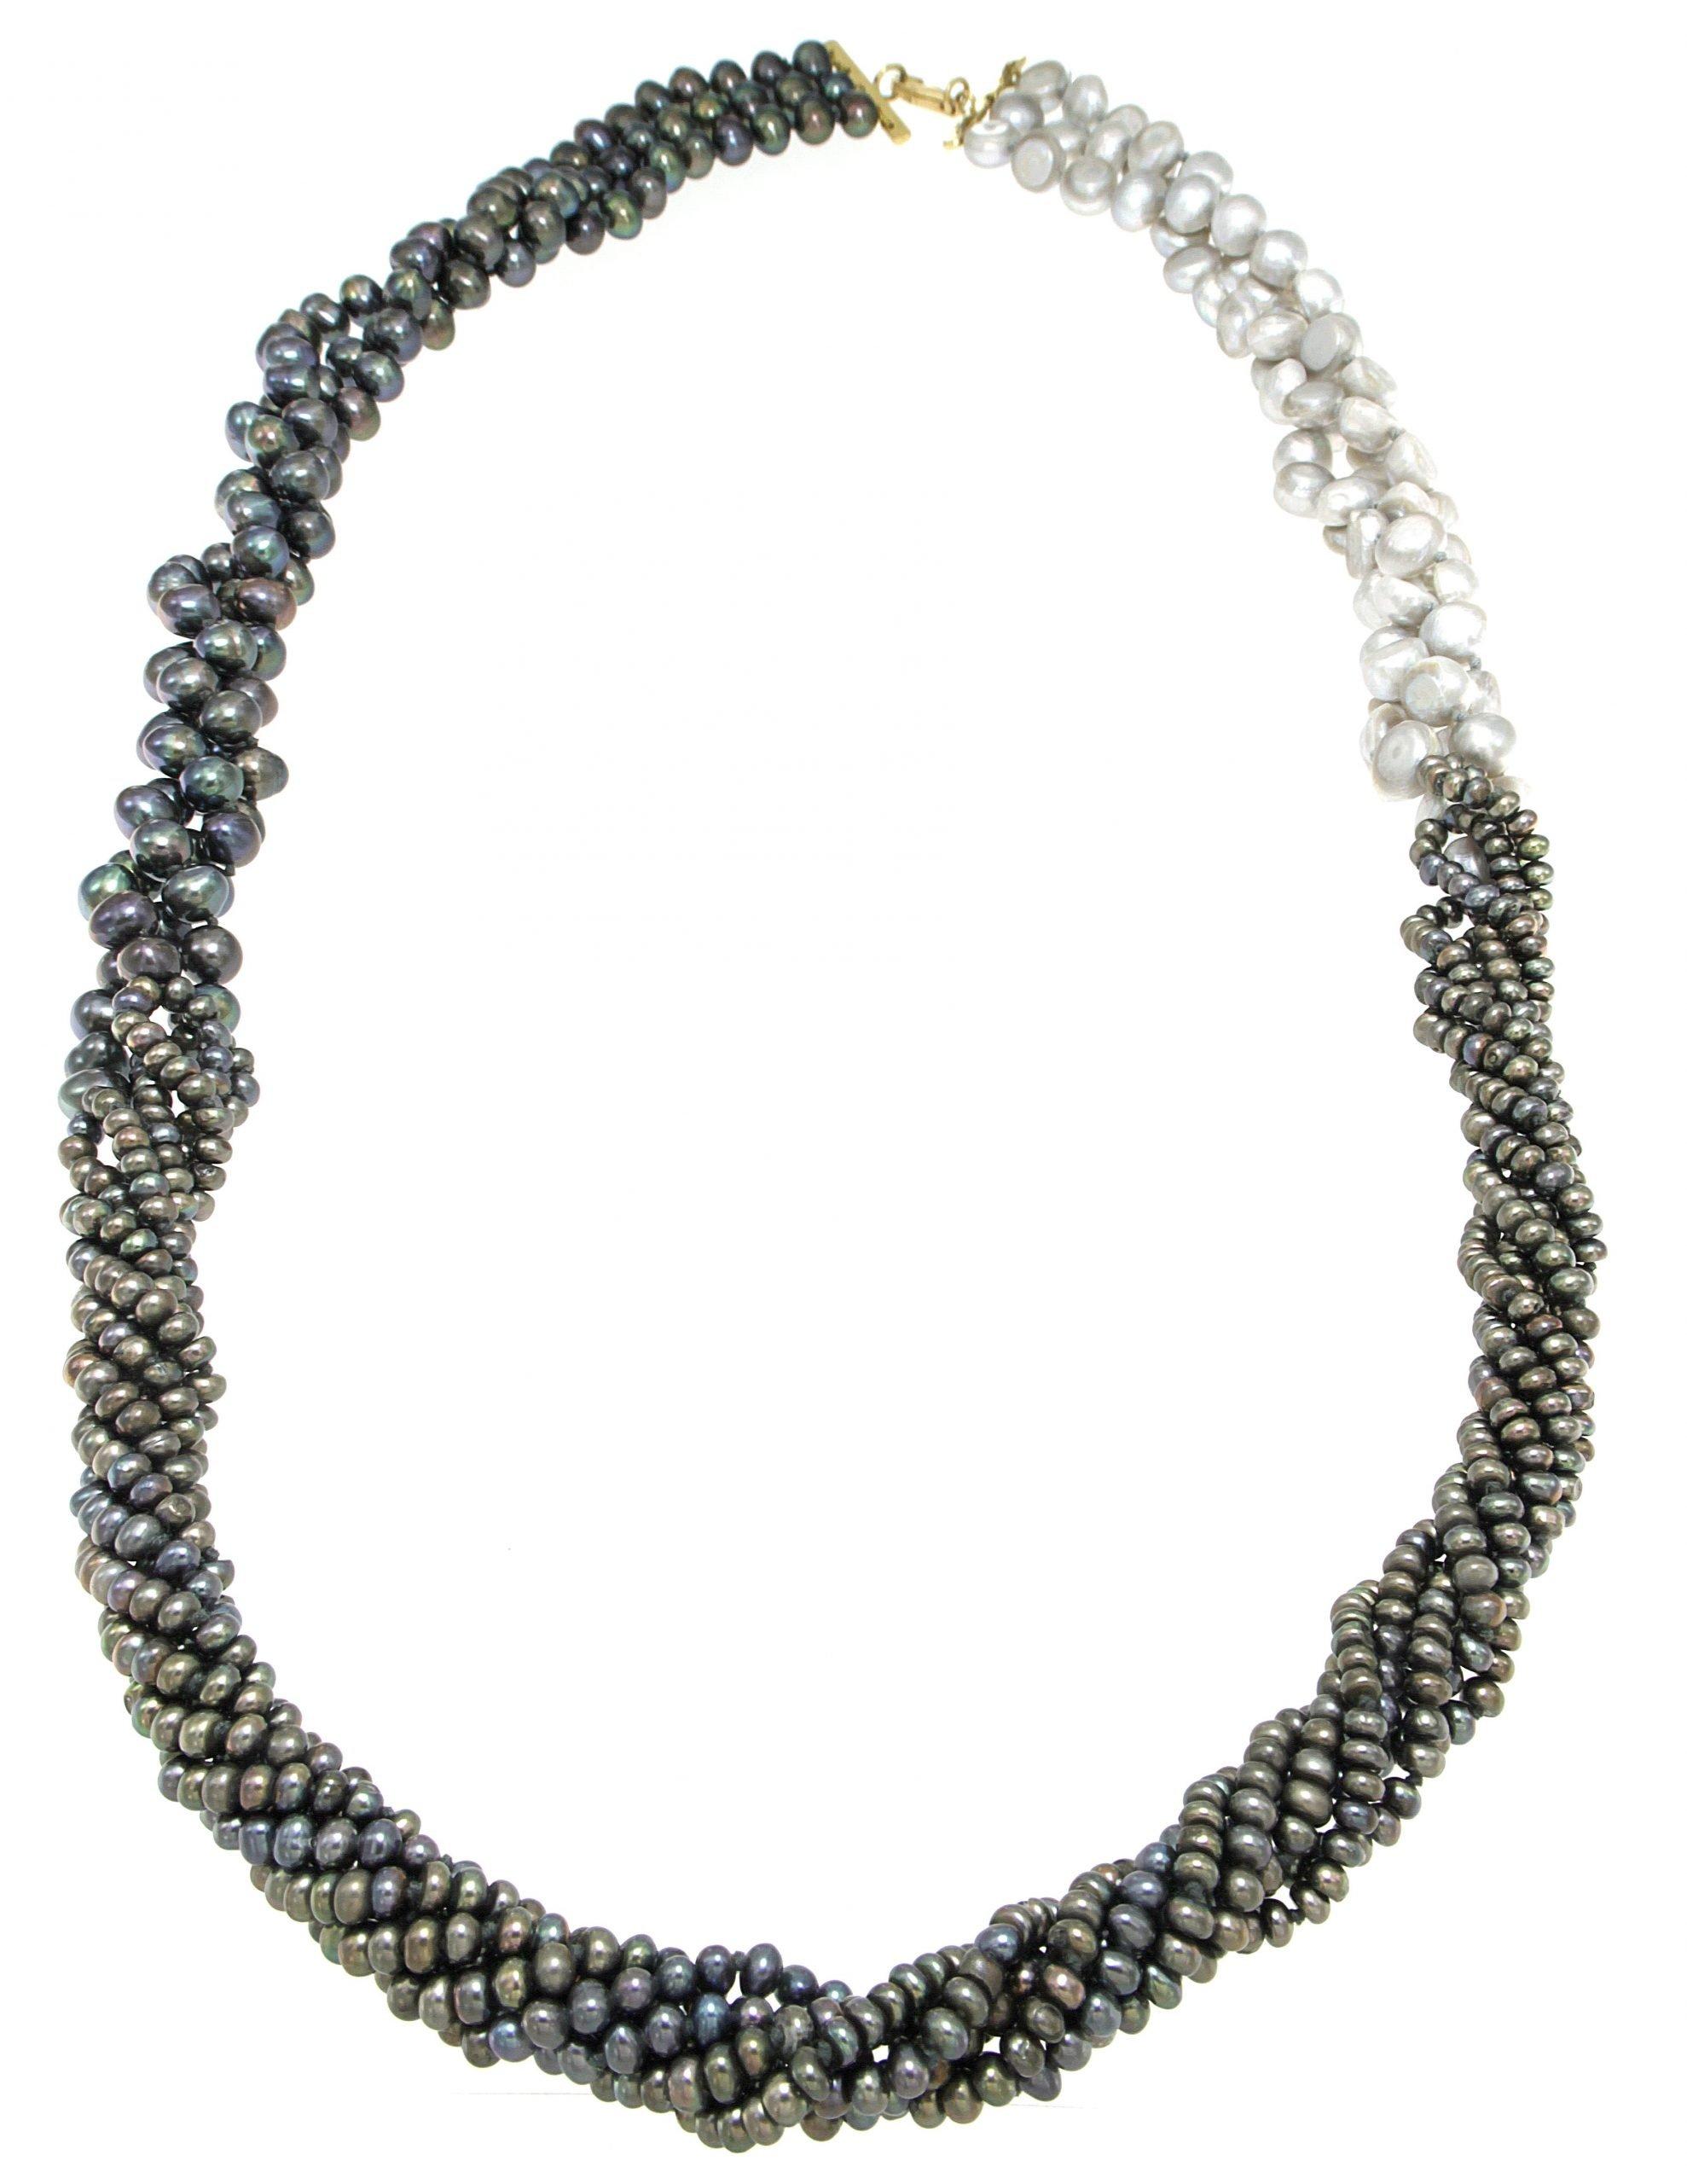 Collana lunga multifilo di perle